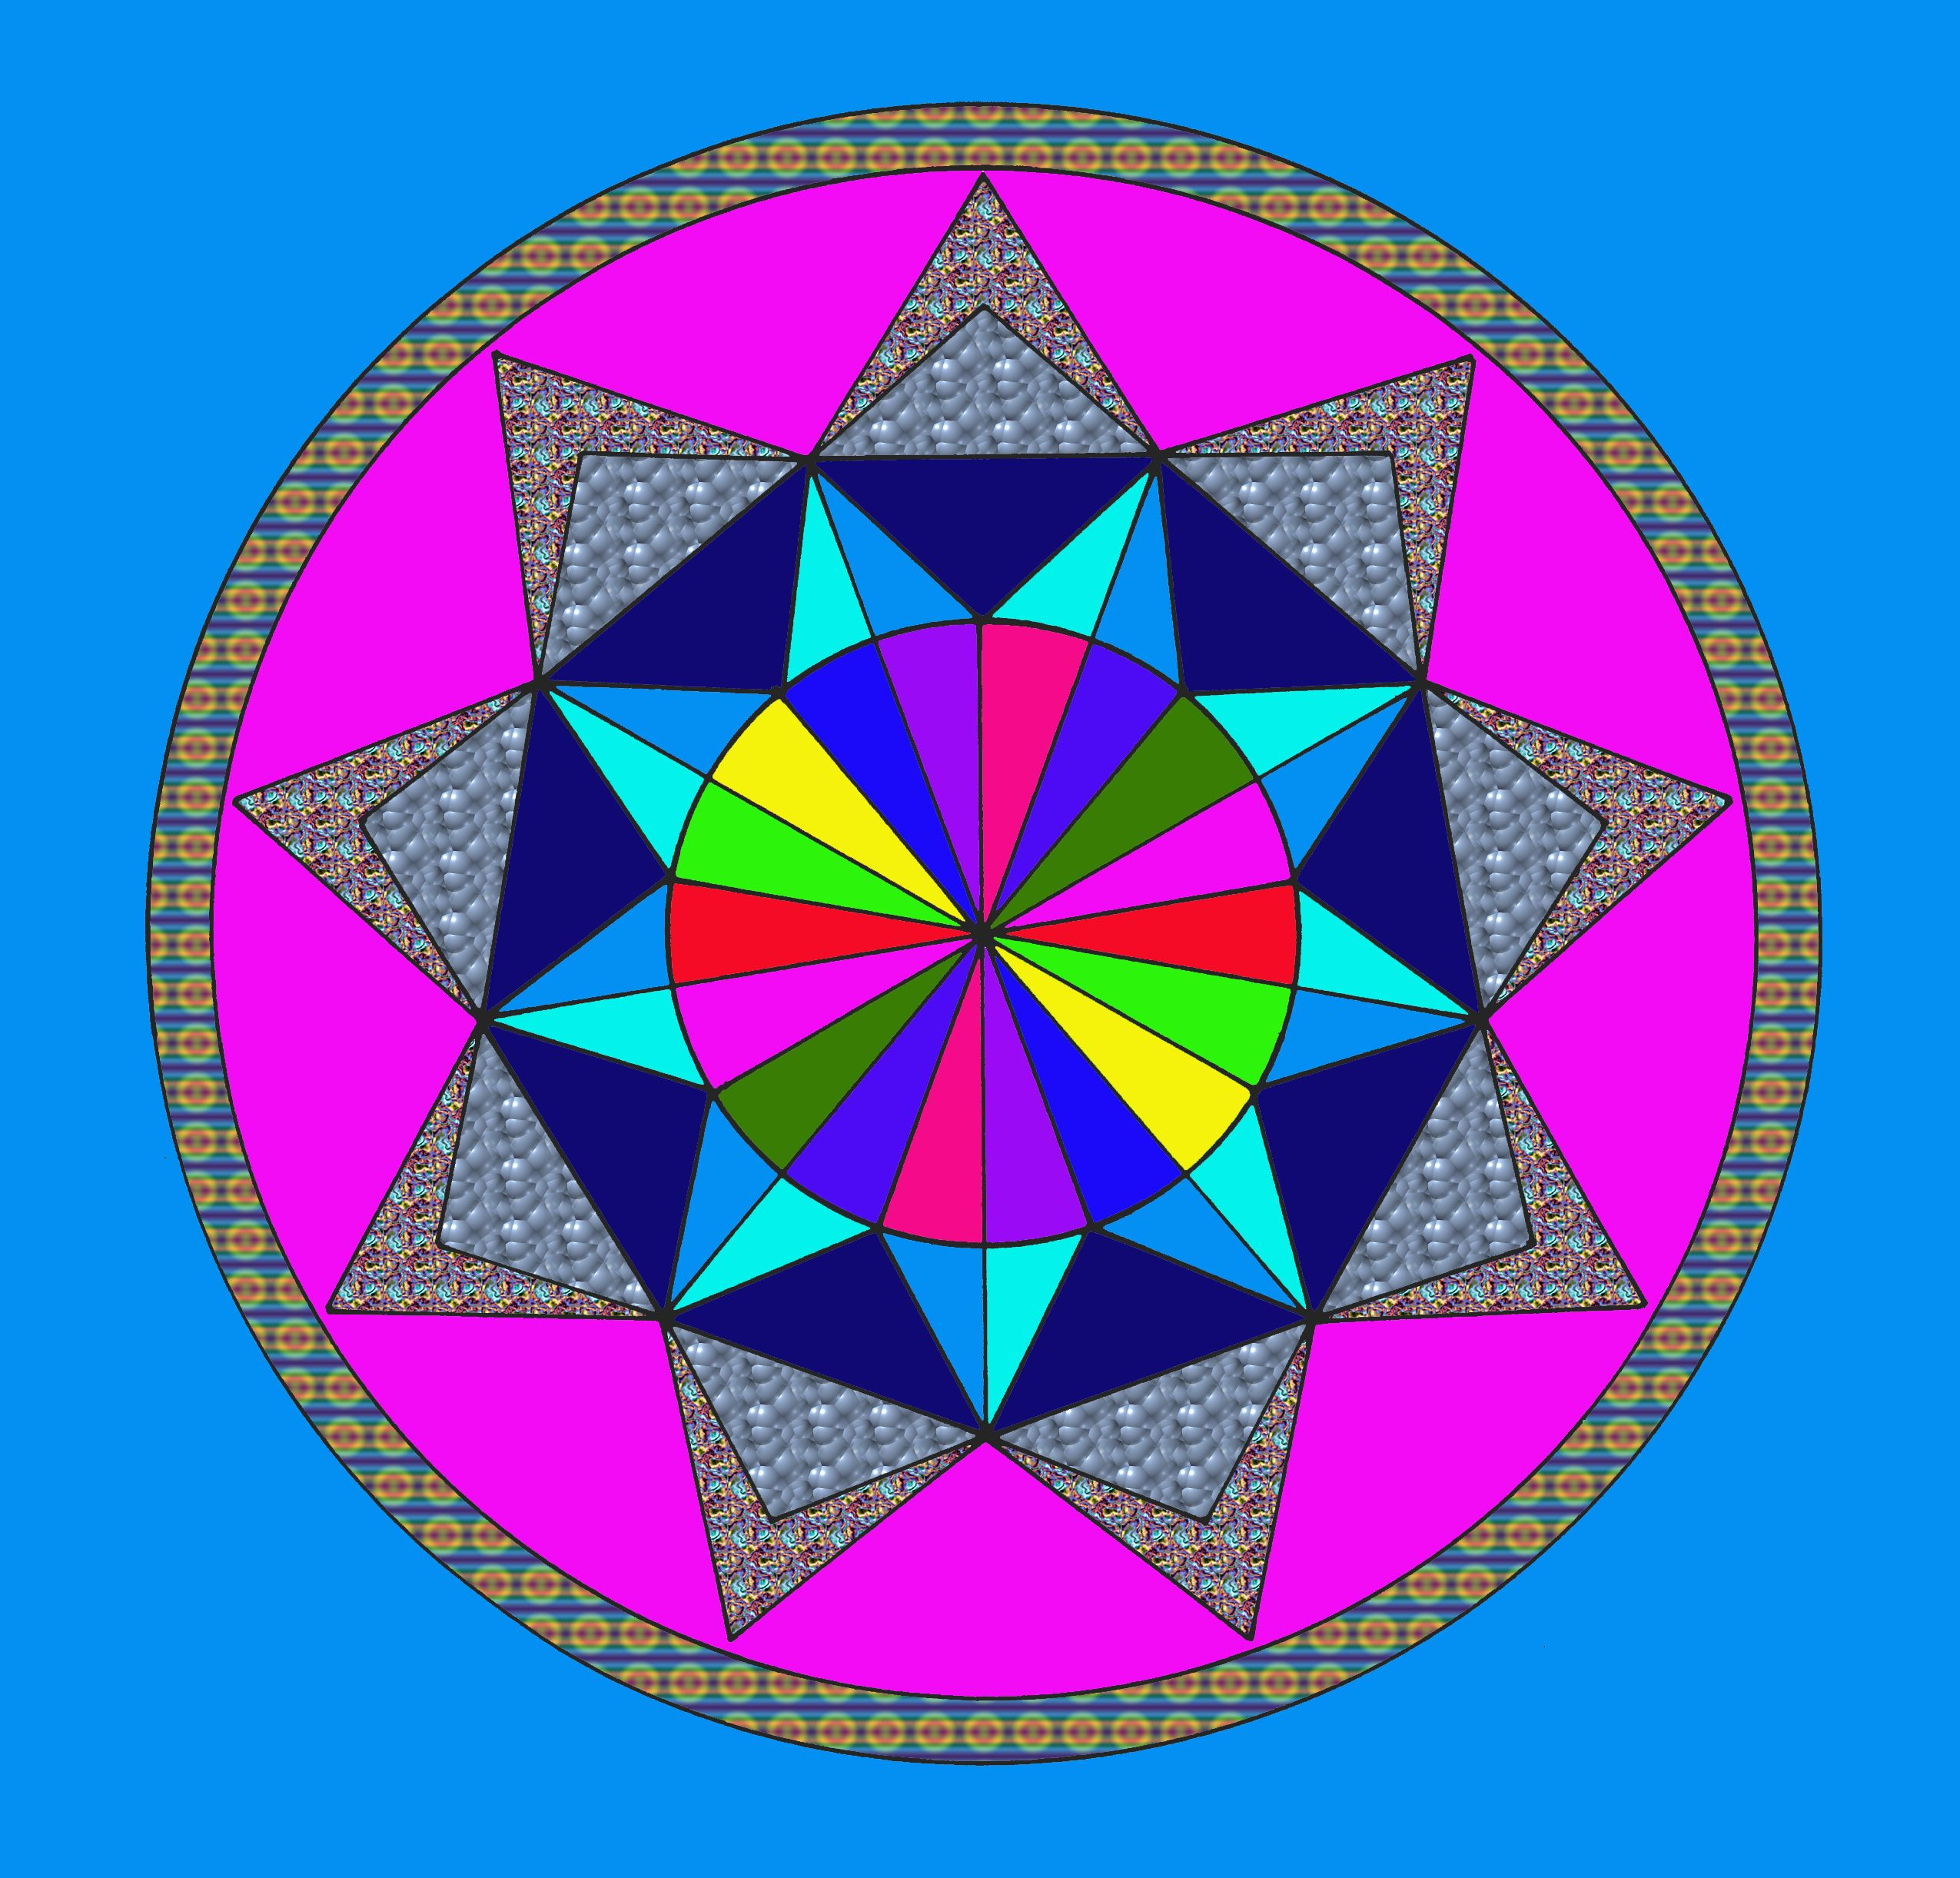 Circsphere by bradbury my mandalas pinterest mandalas